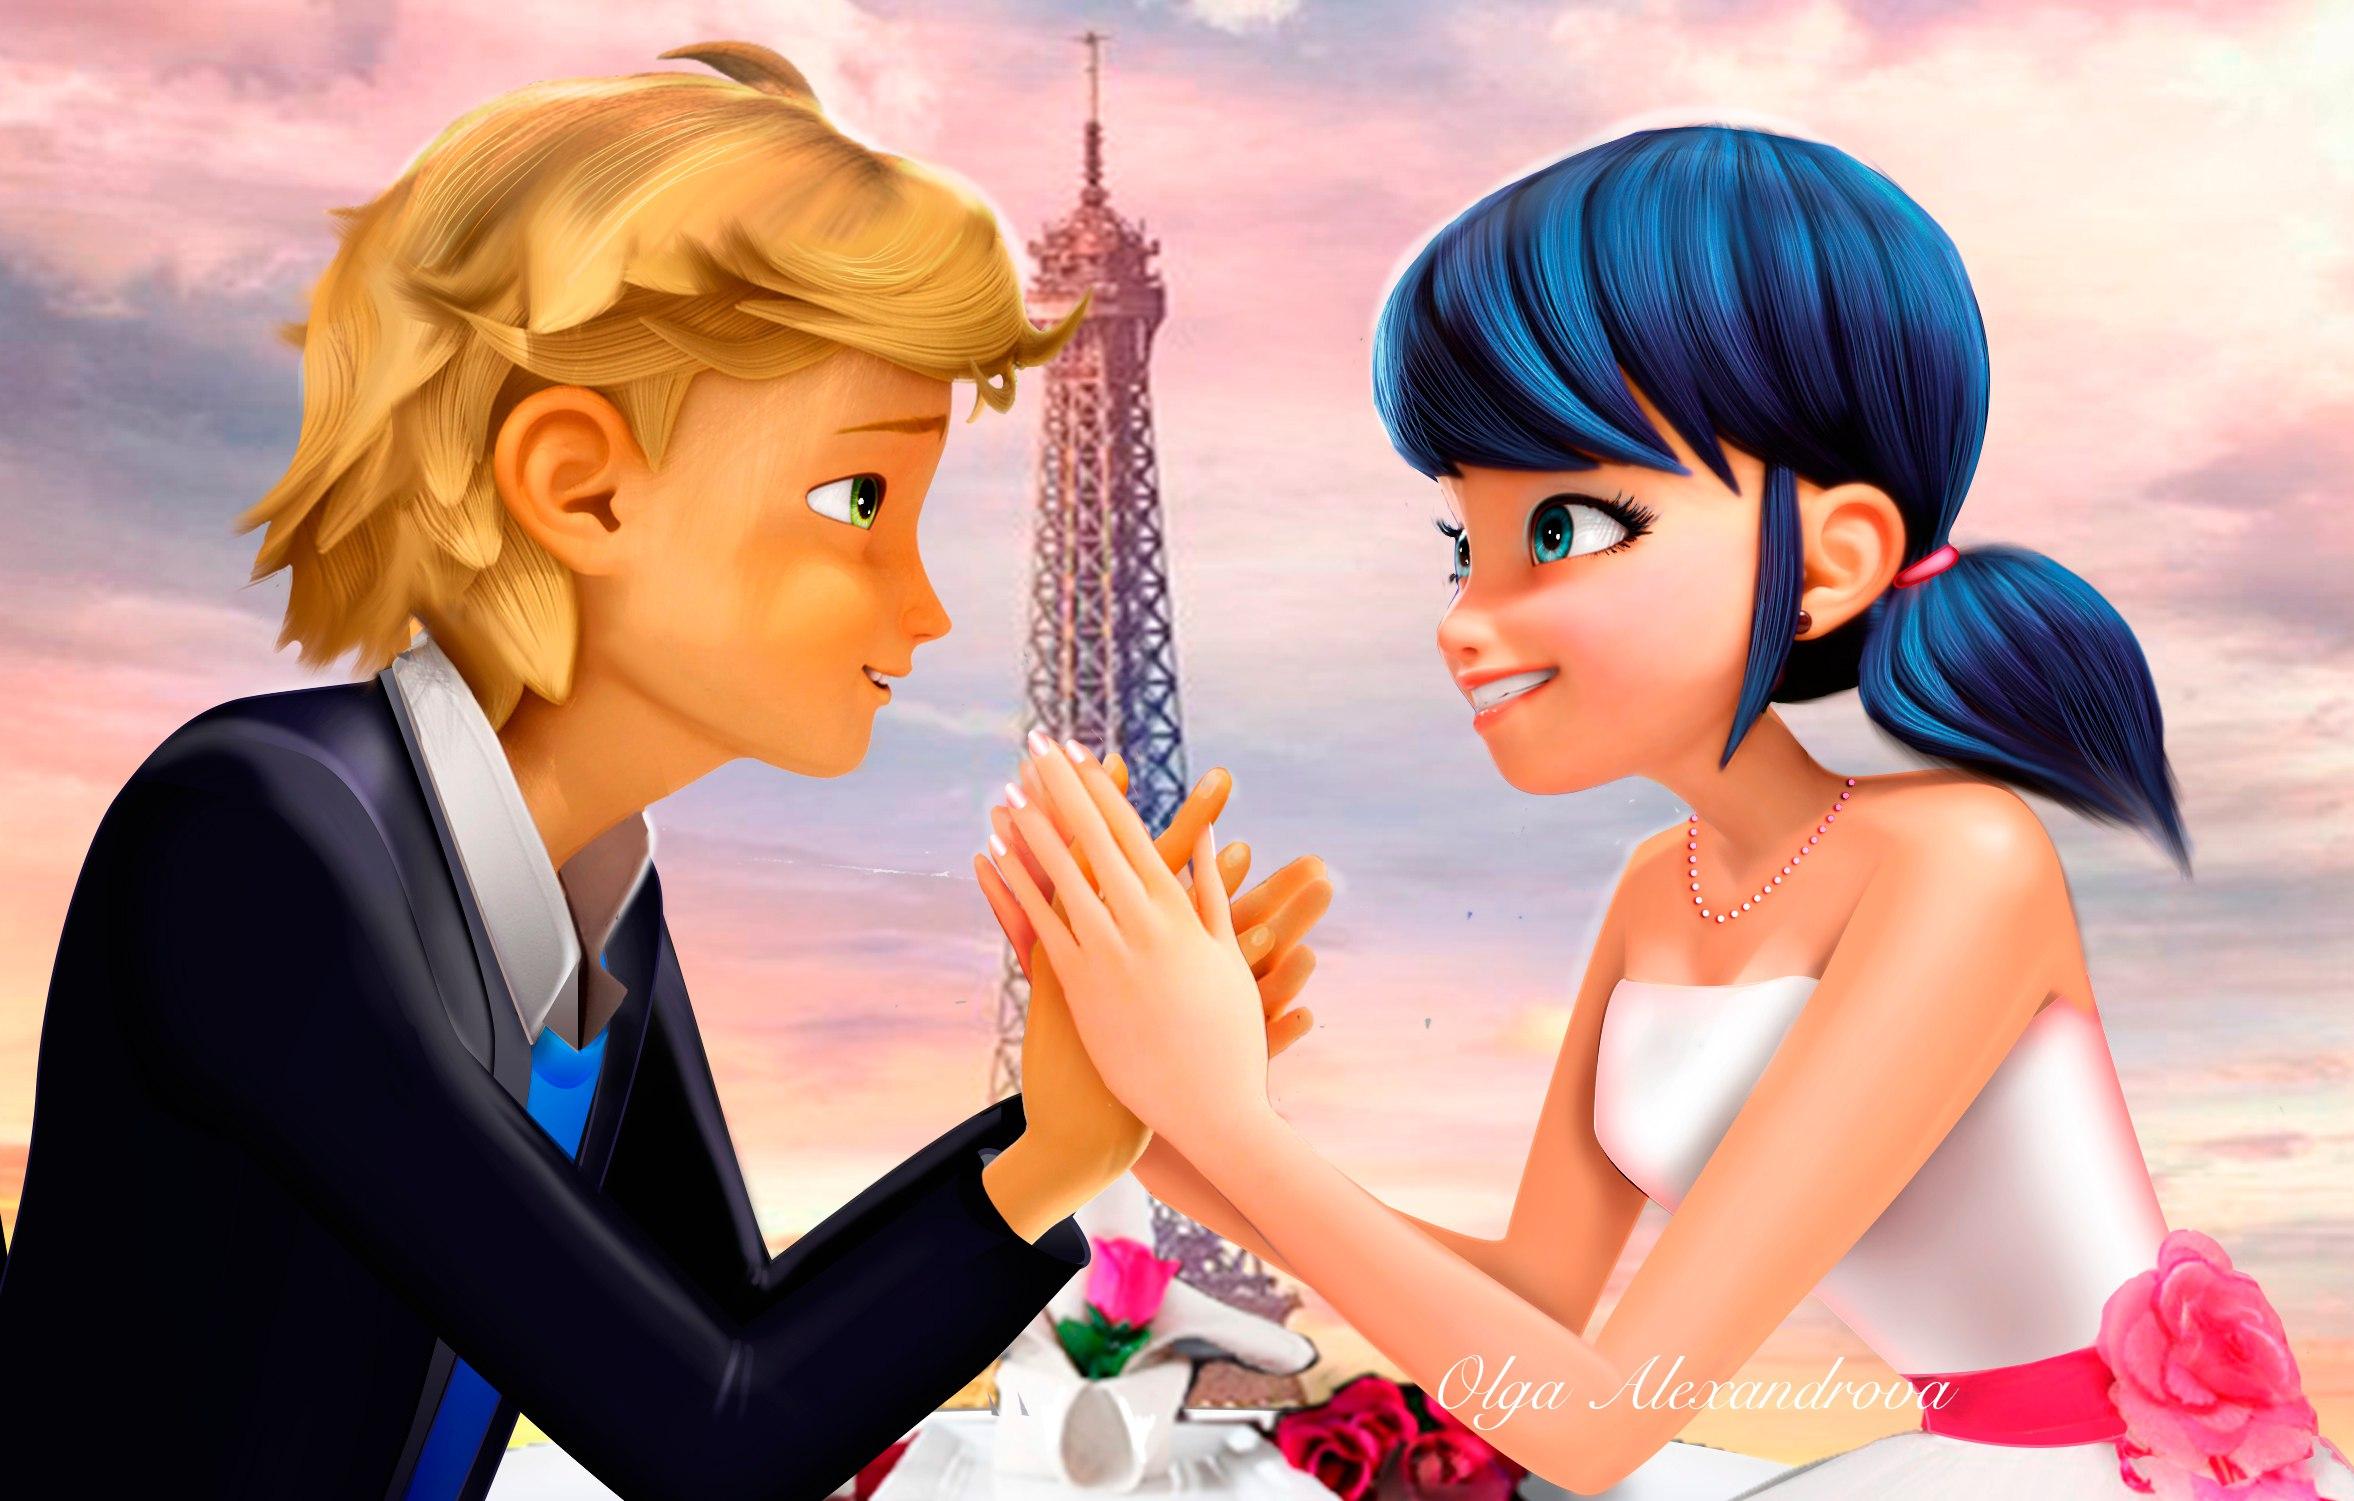 Cute Love Dolls Hd Wallpapers Miraculous Ladybug Romantic Fan Art Youloveit Com